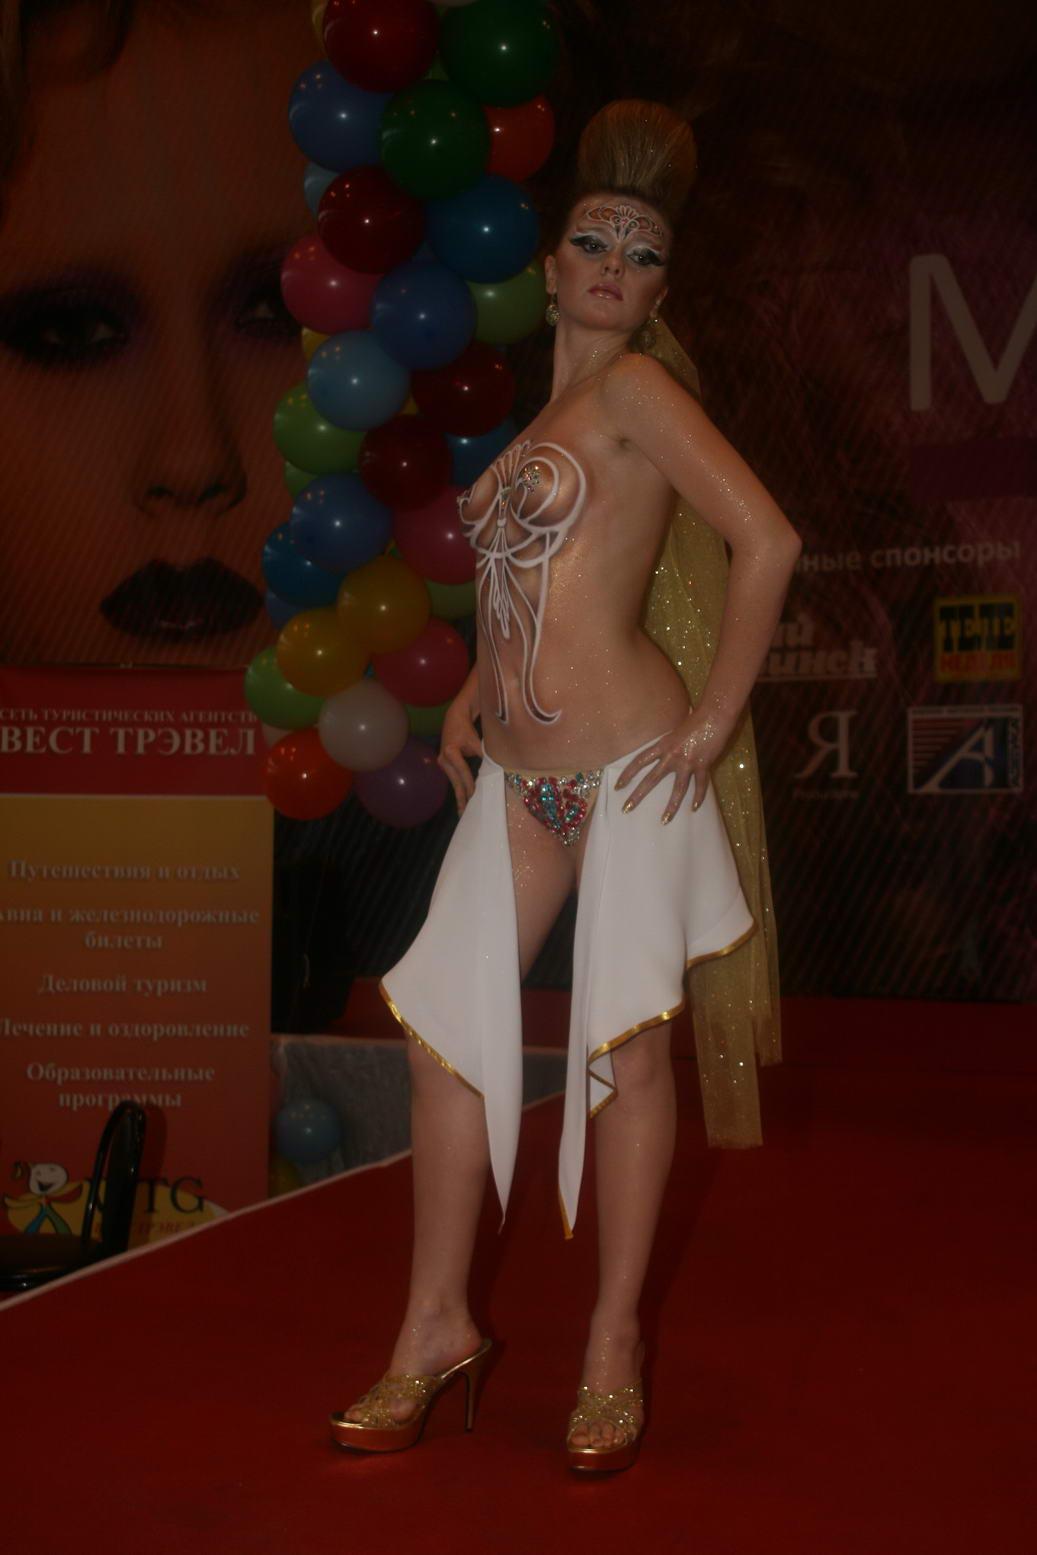 Alyson Hannigan Topless